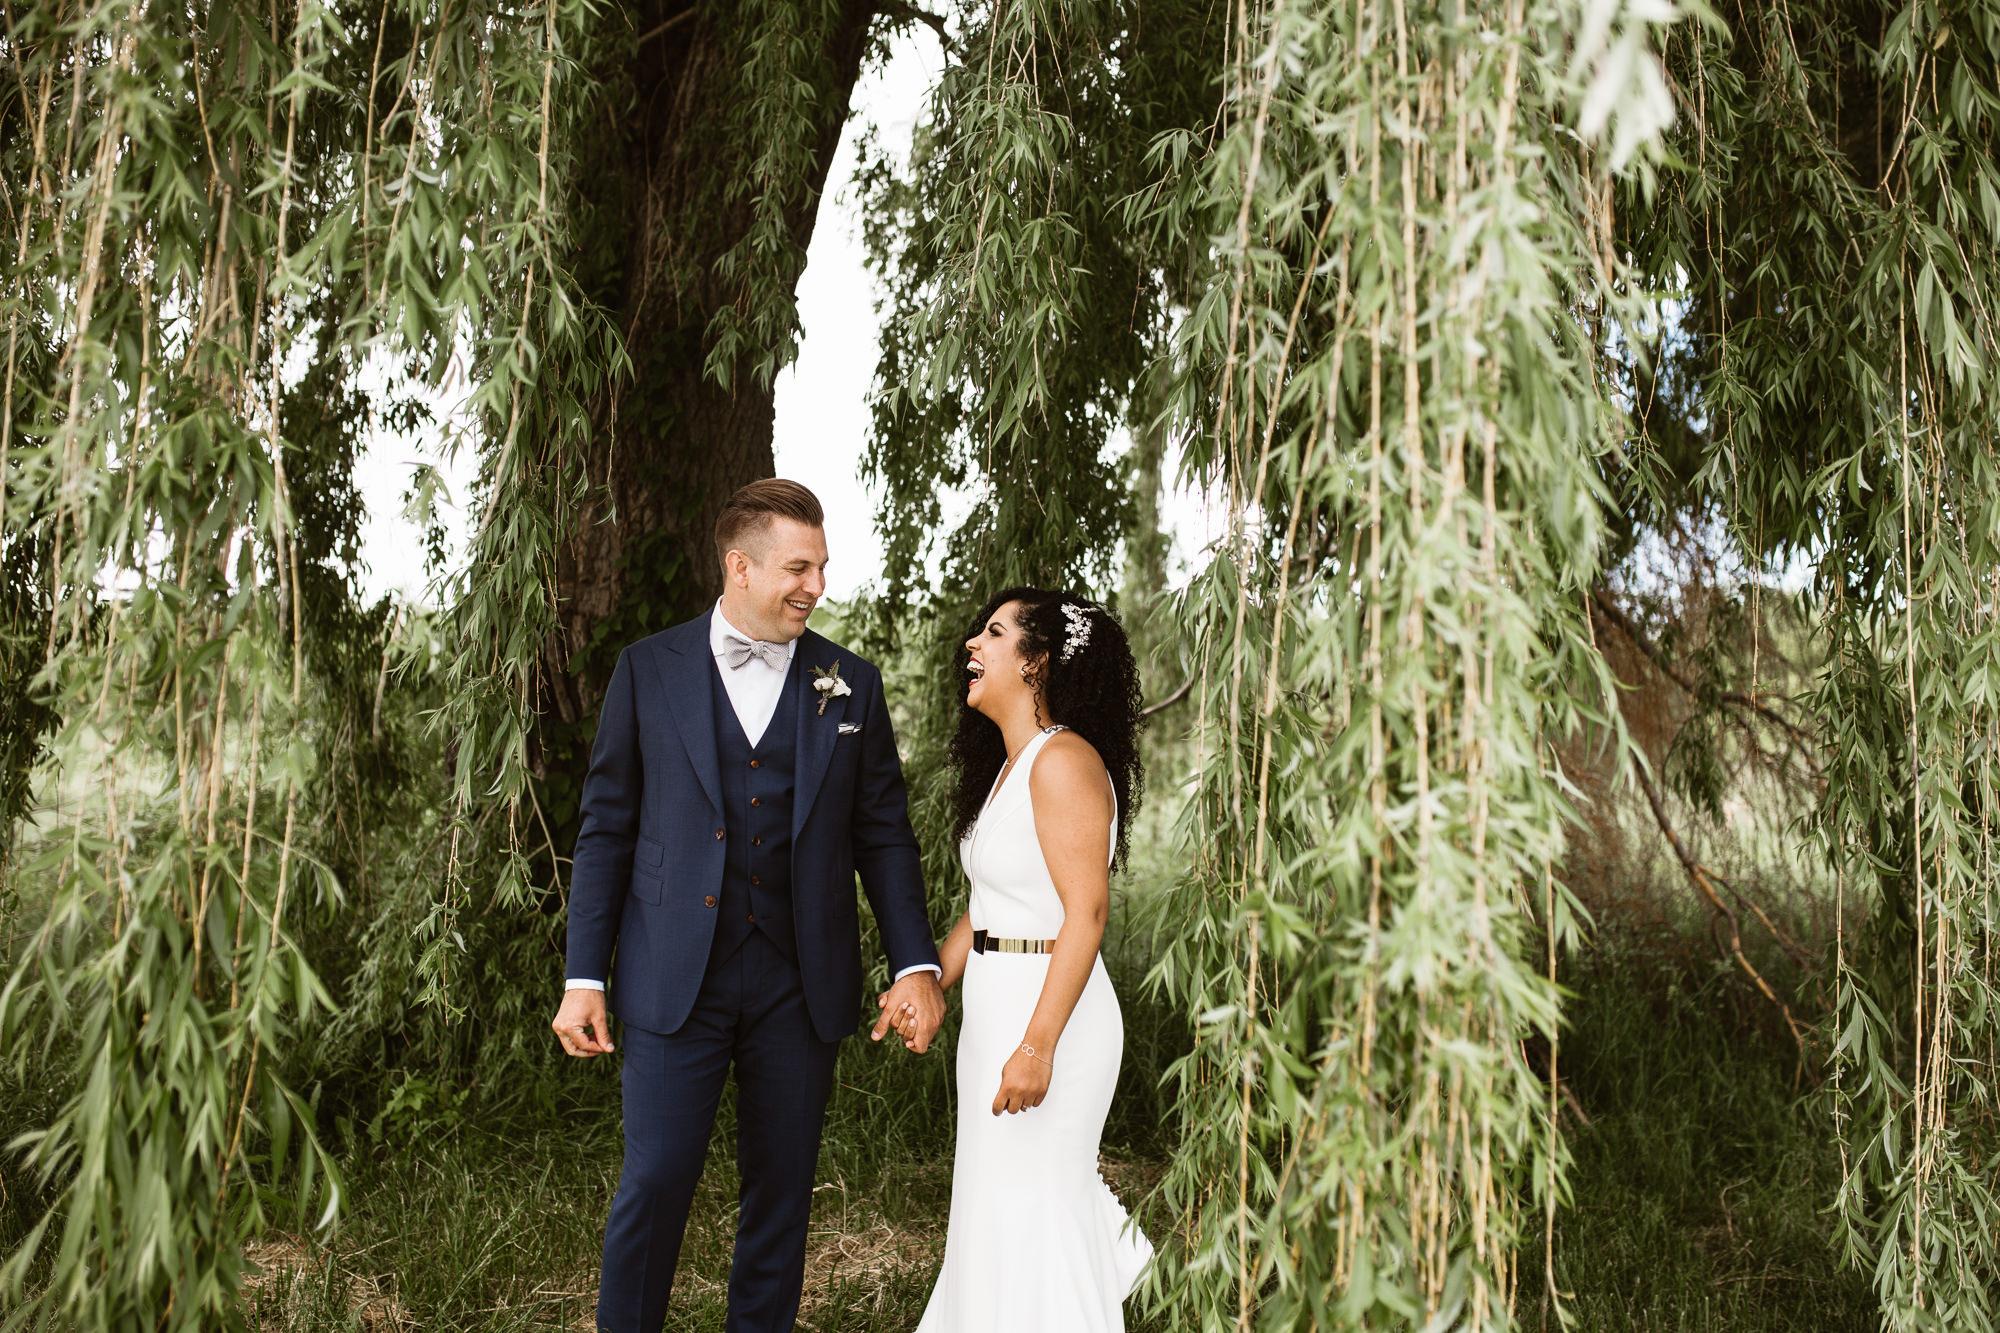 stratus-winery-wedding-vineyard-wedding-vineyard-bride-photo-by-reed-photography-029.jpg